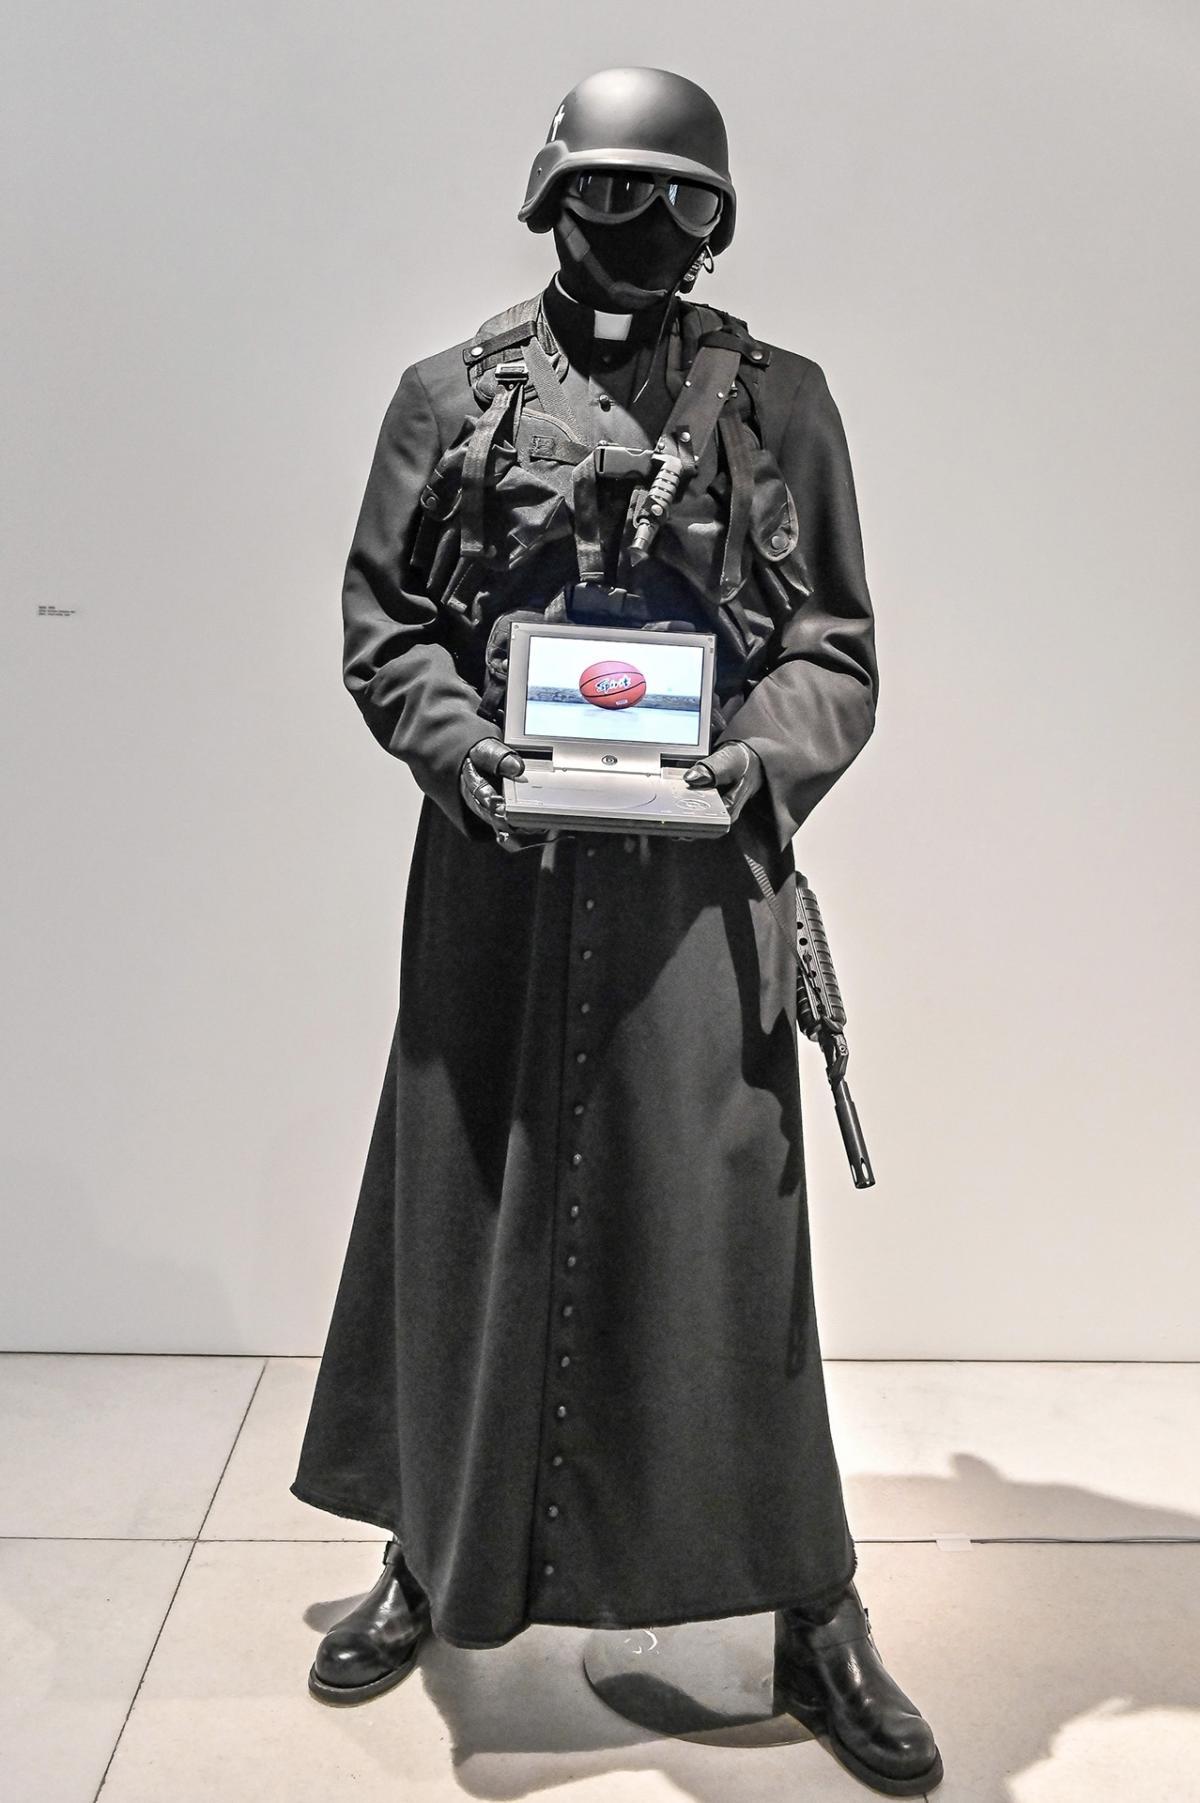 [EN/PL] 'Knaf's Not Dead' at PGS Gallery